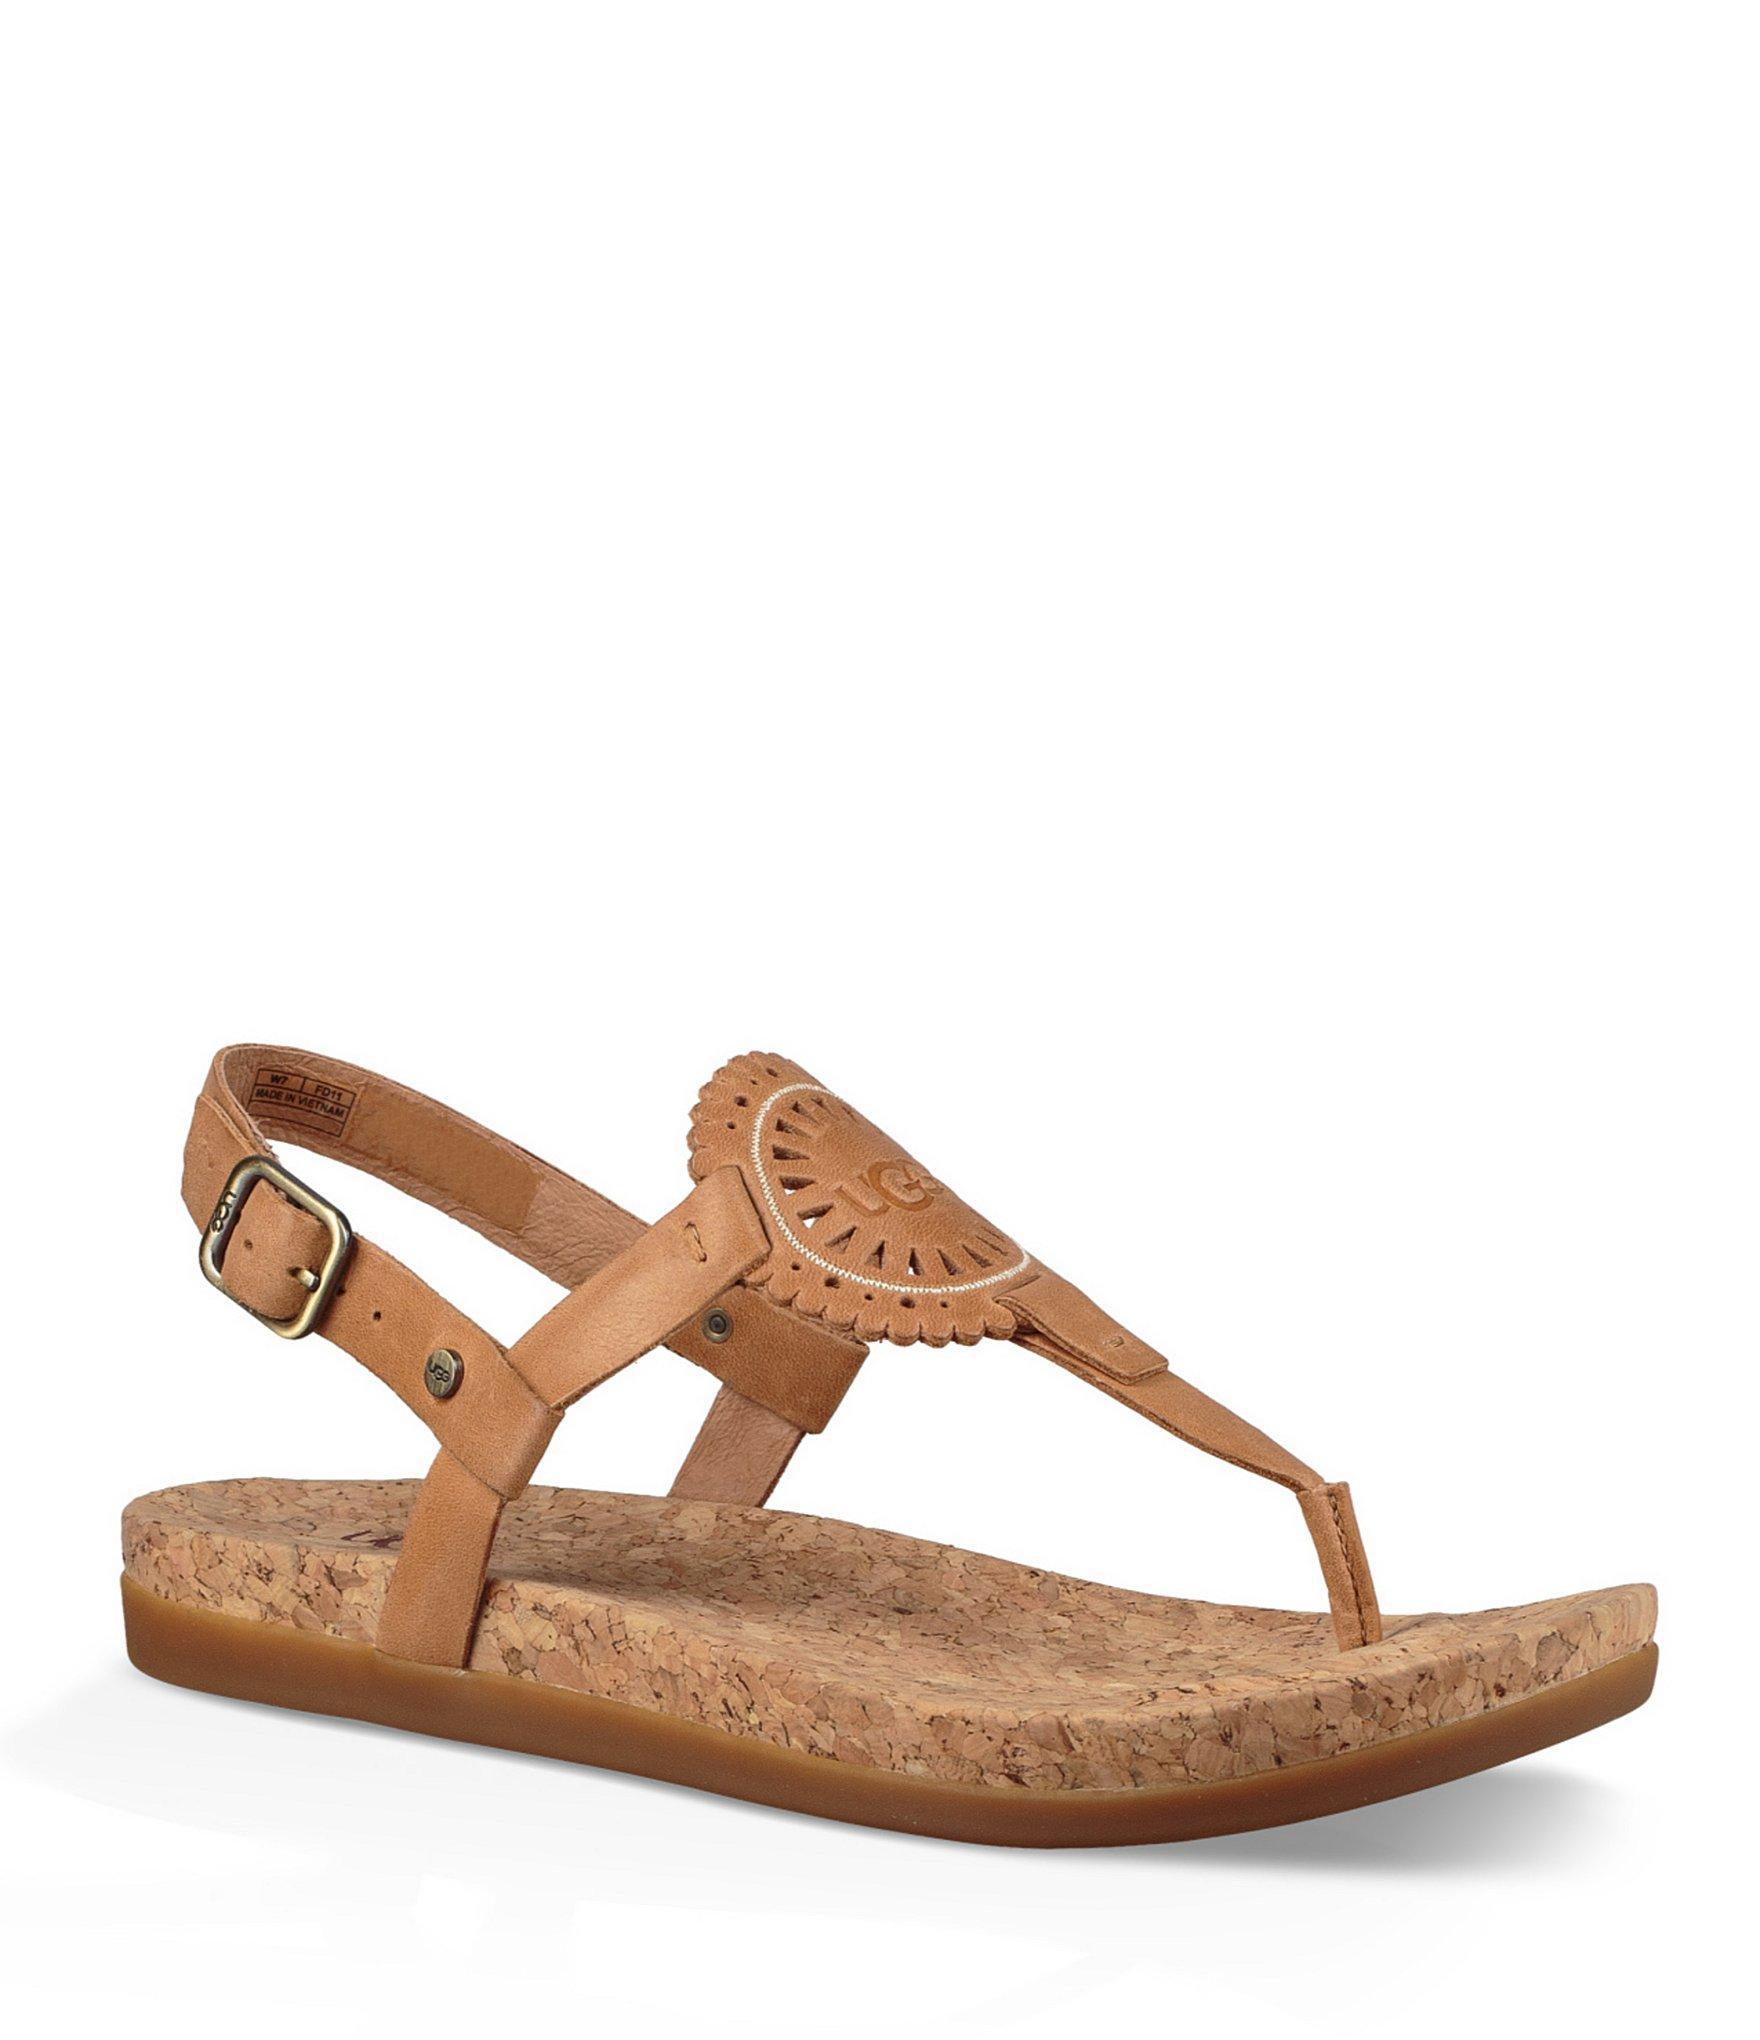 b98546485d87c Lyst - UGG Ayden Ii Leather   Cork Thong Sandals in Brown